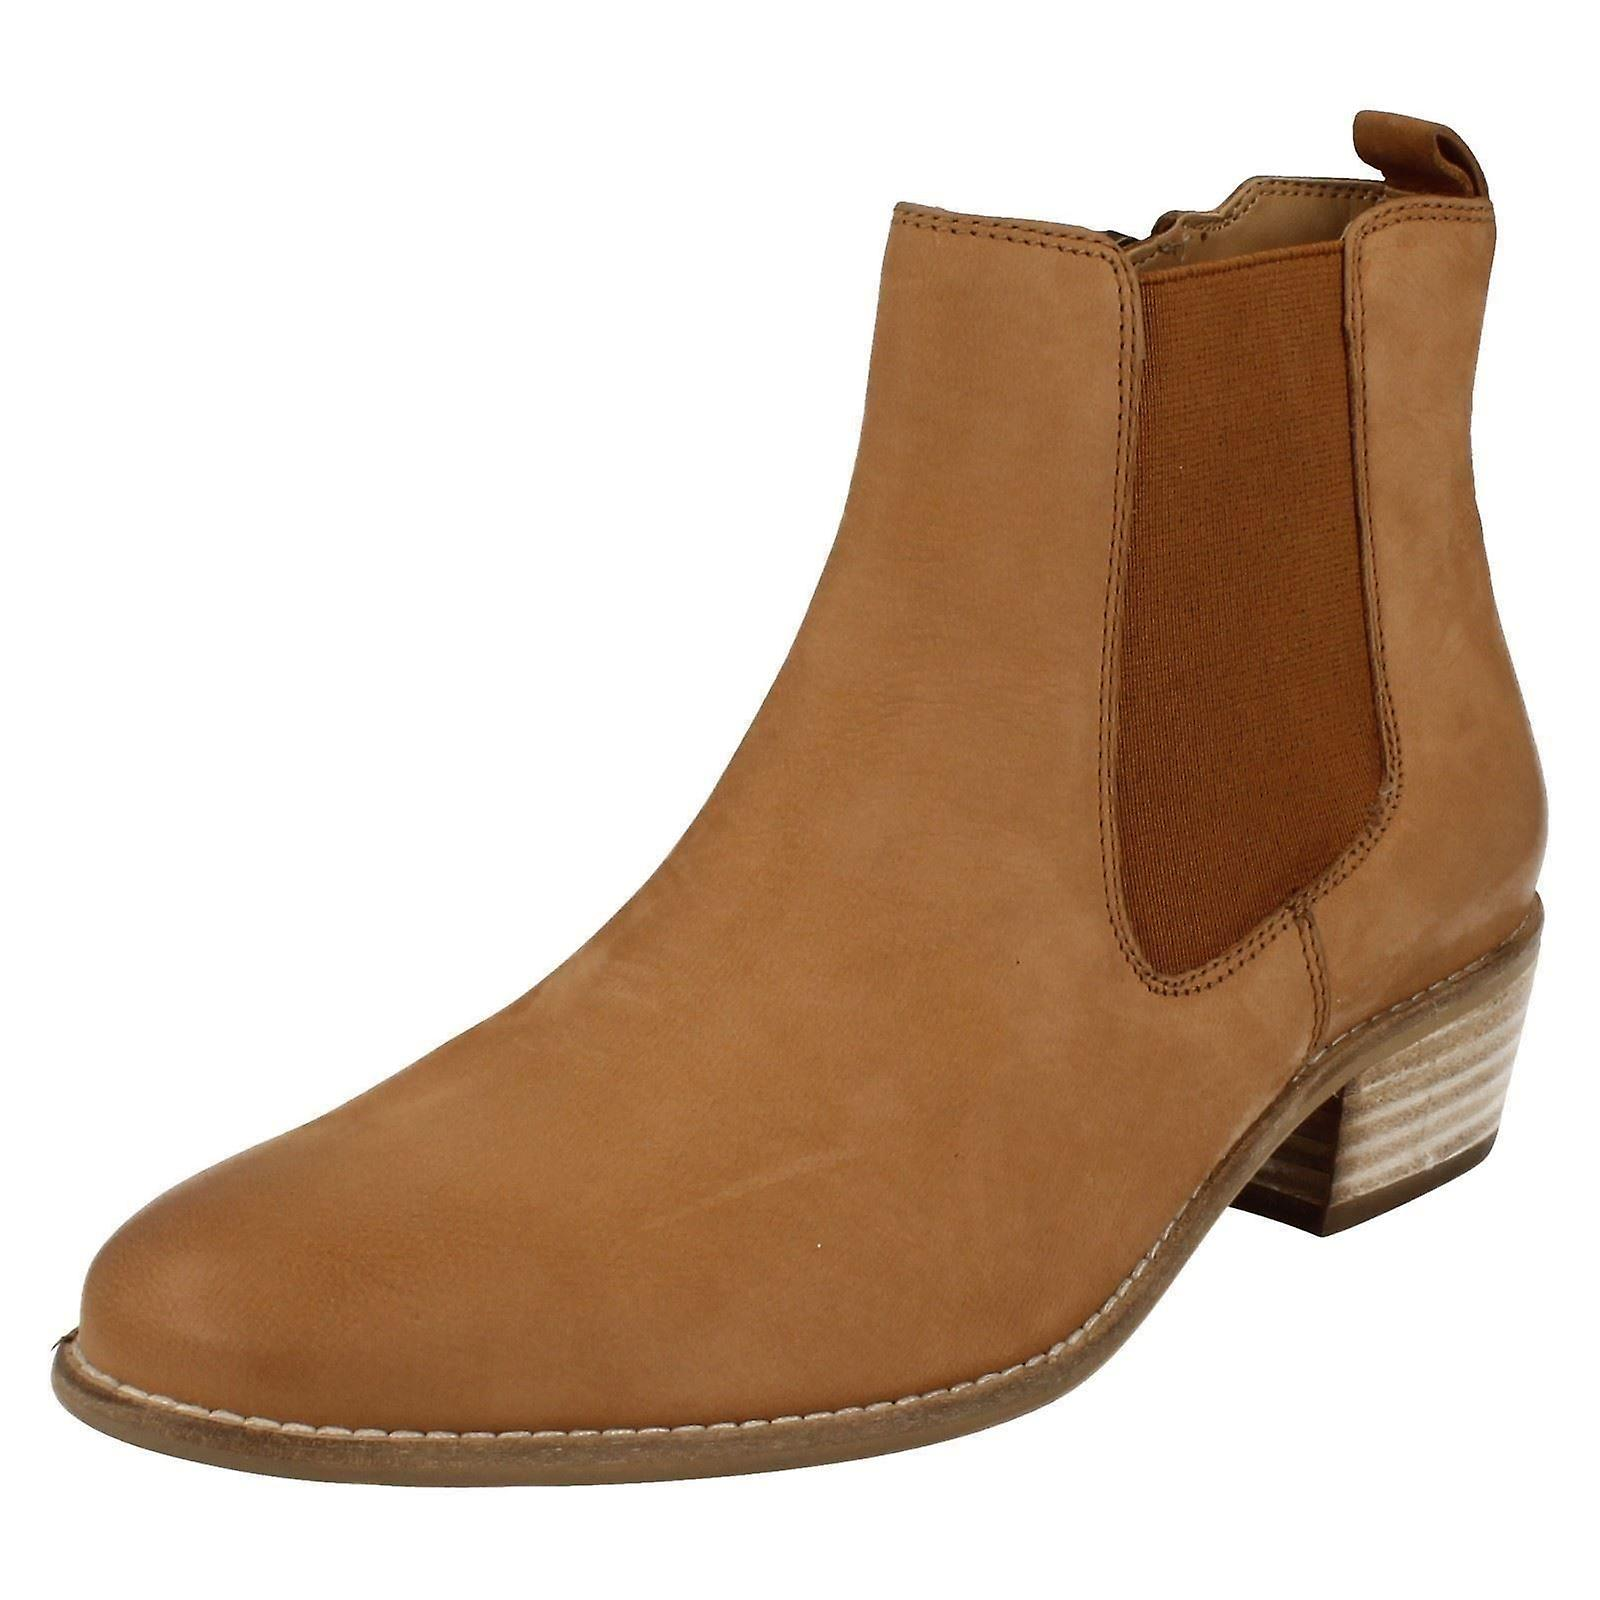 Buty za kostkę stylu Van Dal Chelsea Benton APvHo